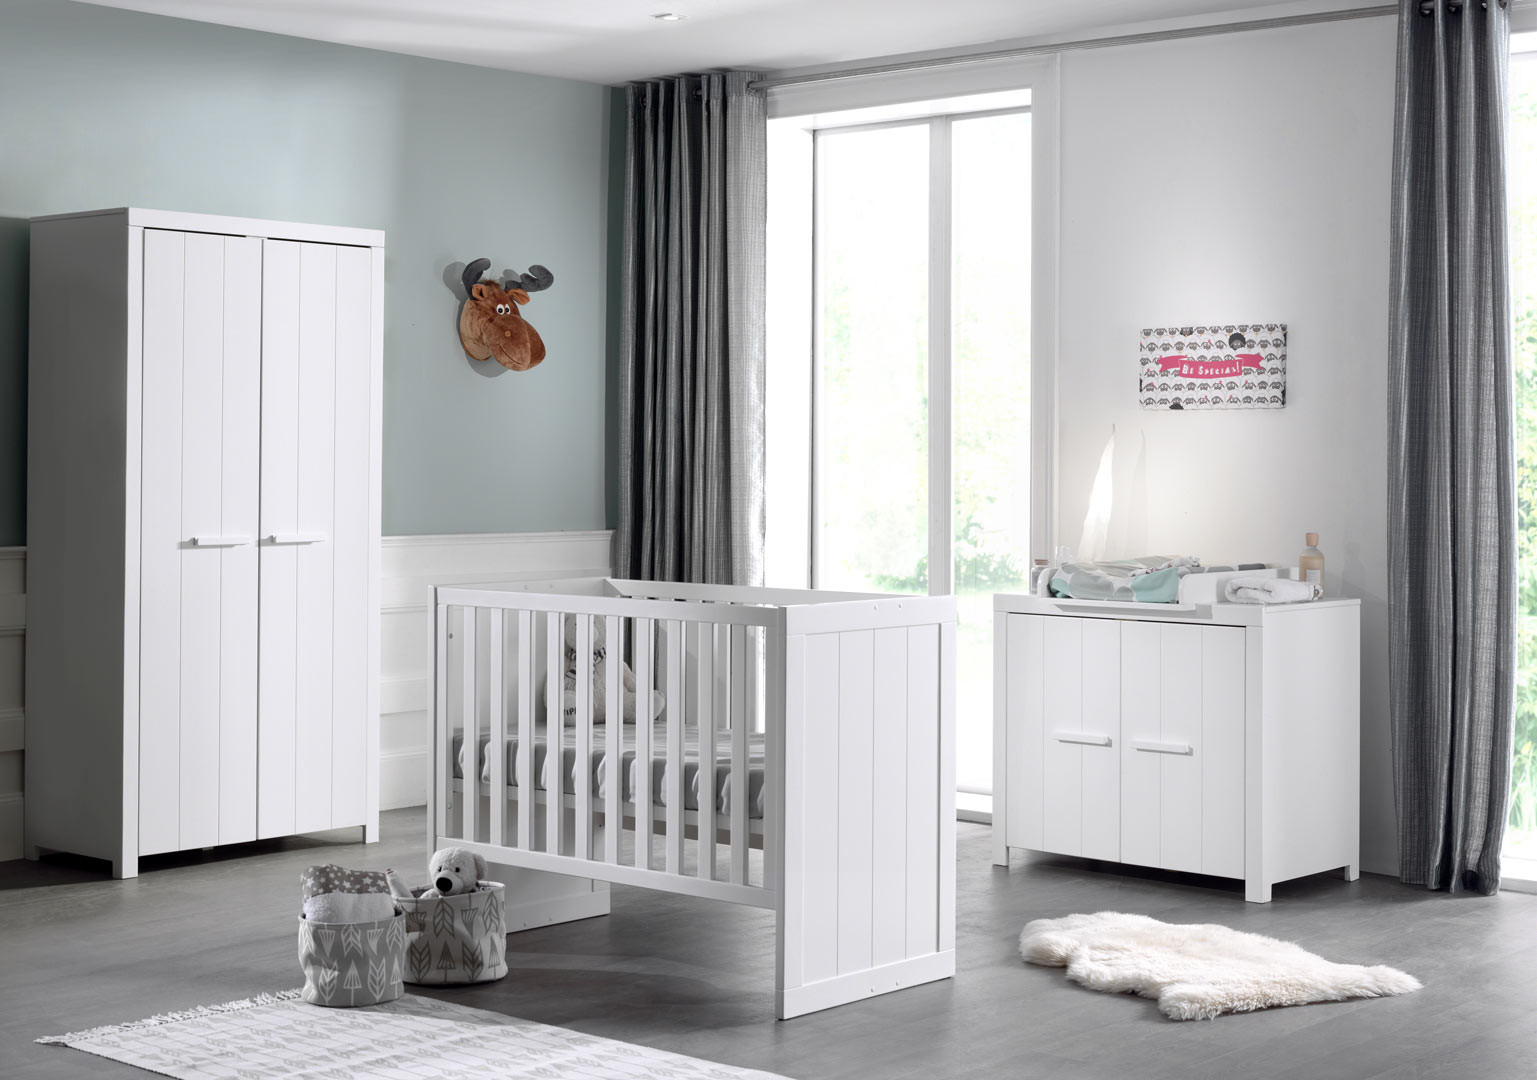 Chambre bébé contemporaine pin massif laqué blanc Ulrick